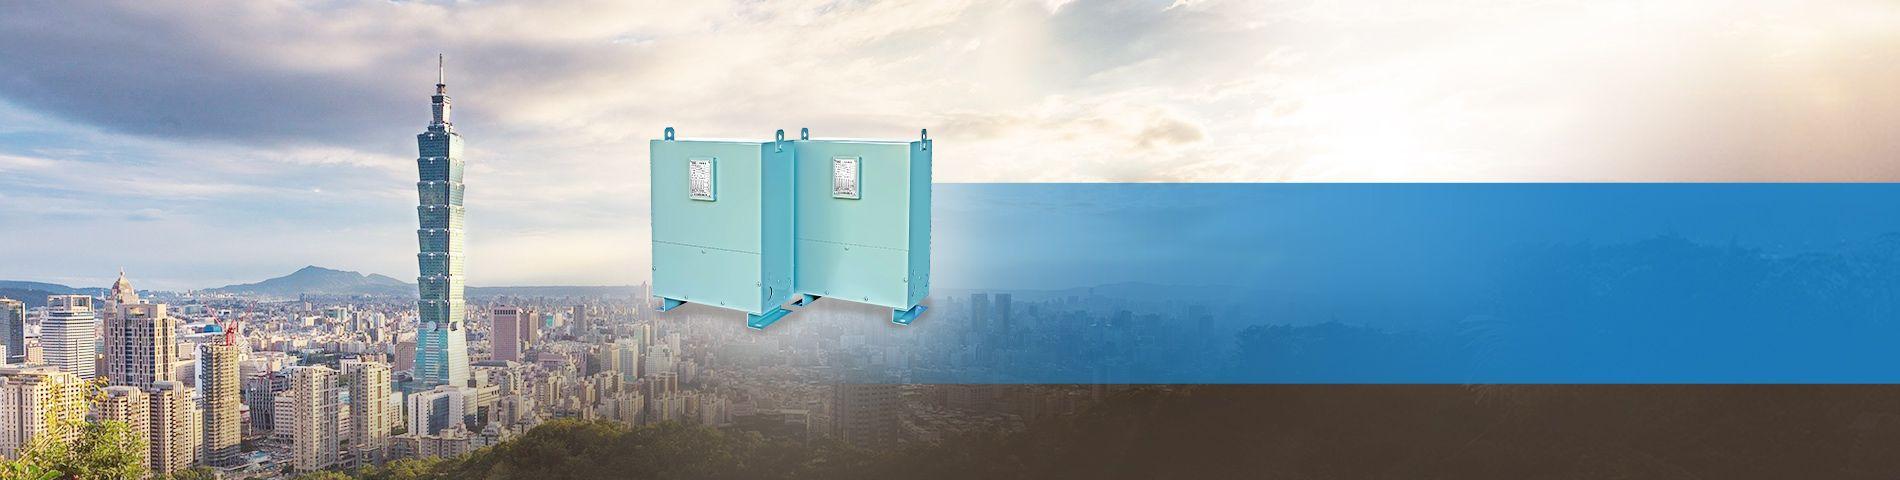 Non-Ventilated Resin-Cast Transformer for Taipei 101